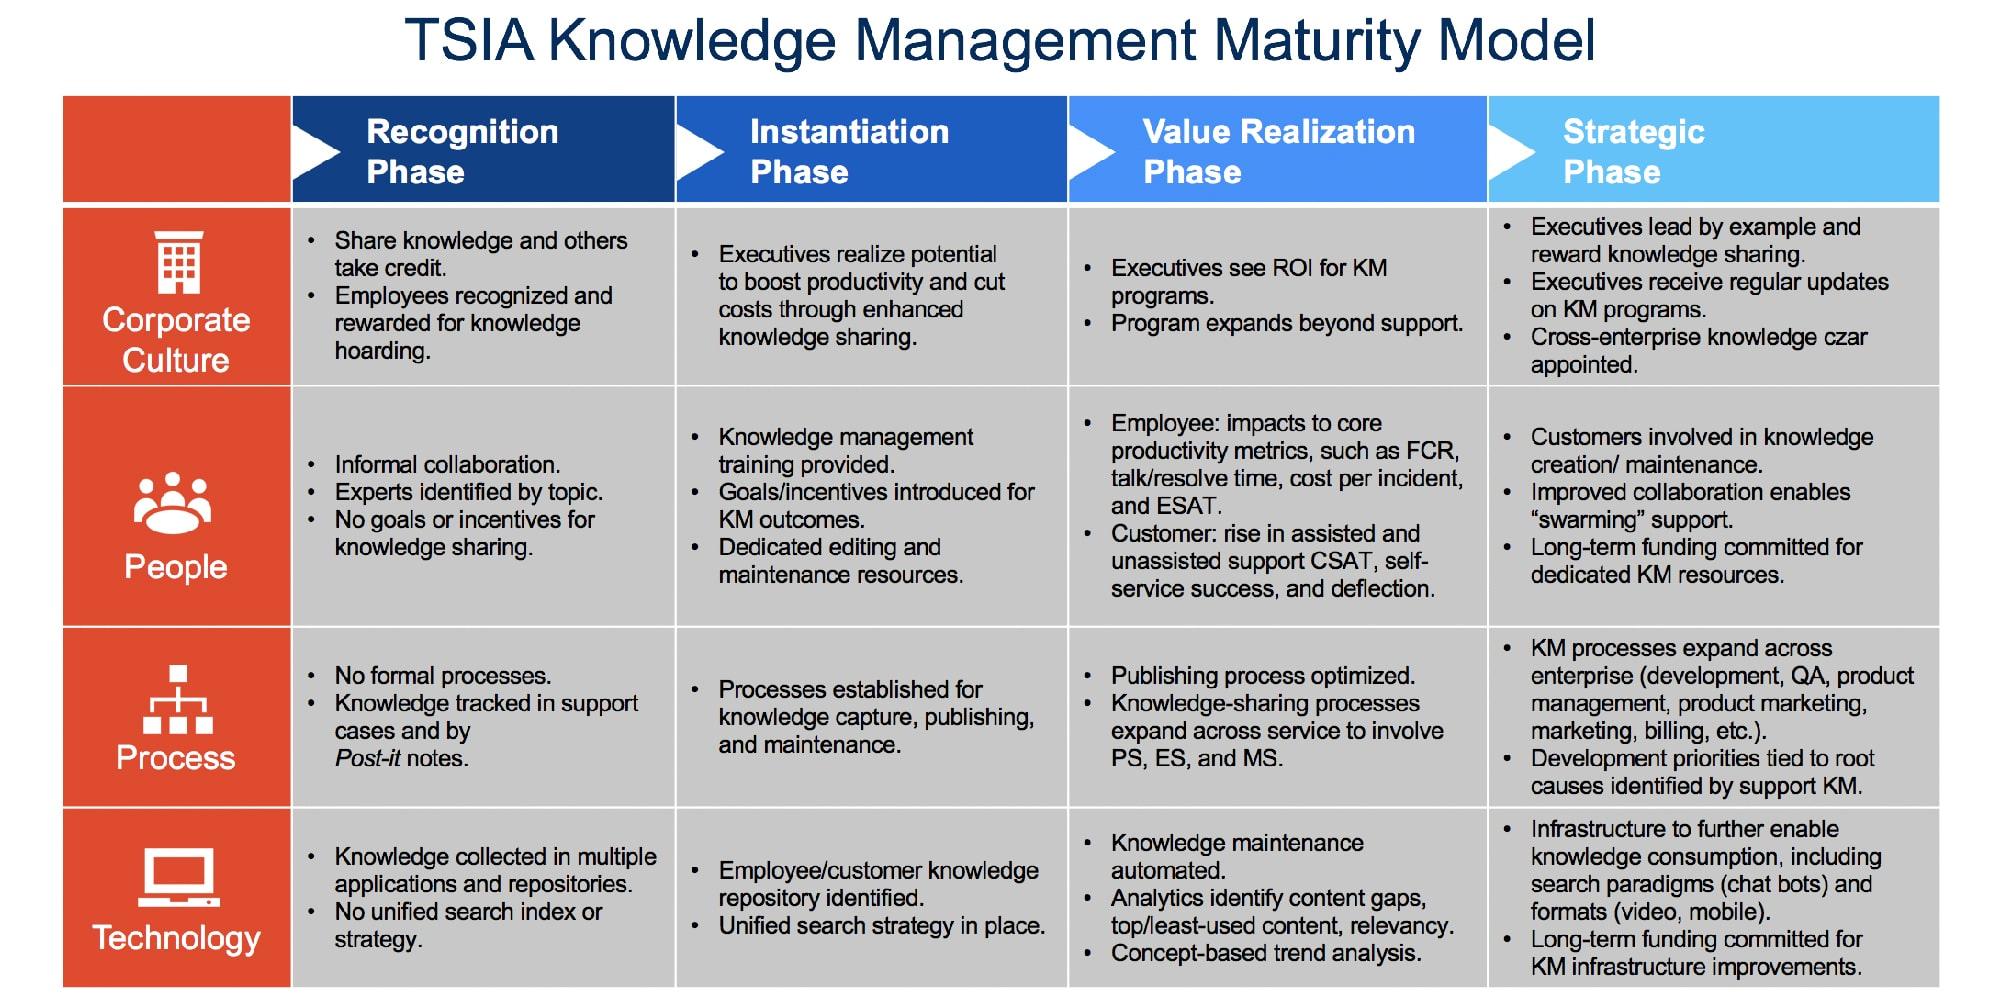 The TSIA Knowledge Maturity Model